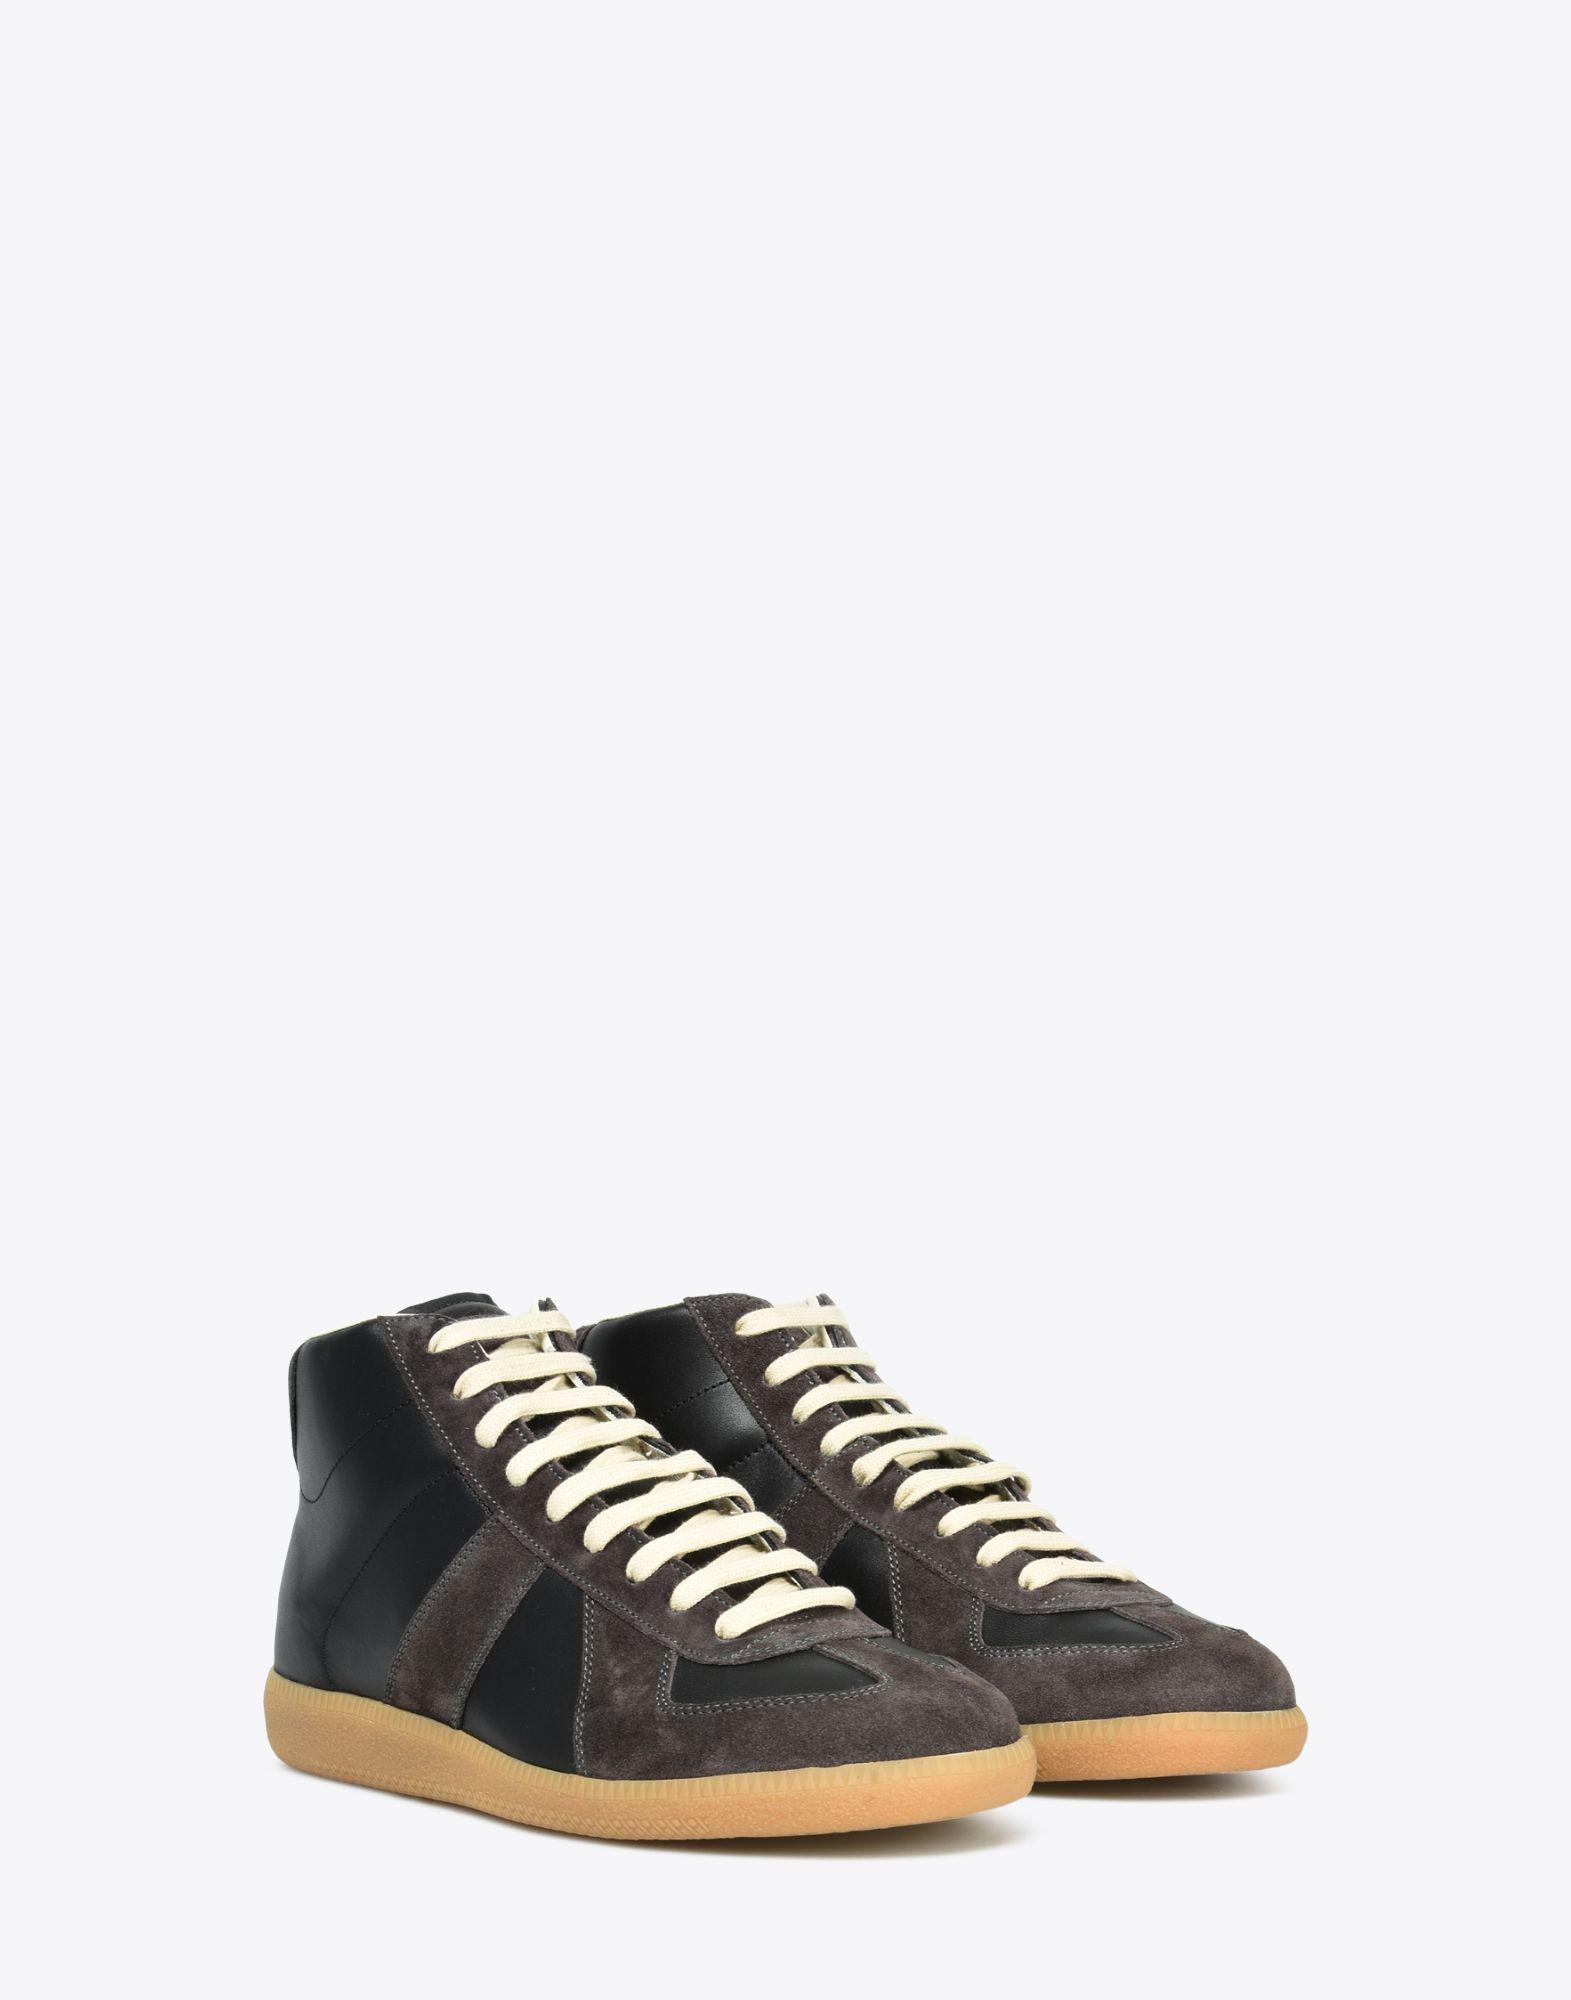 fd1a7046caa Men's Black High Top Calfskin Replica Sneakers